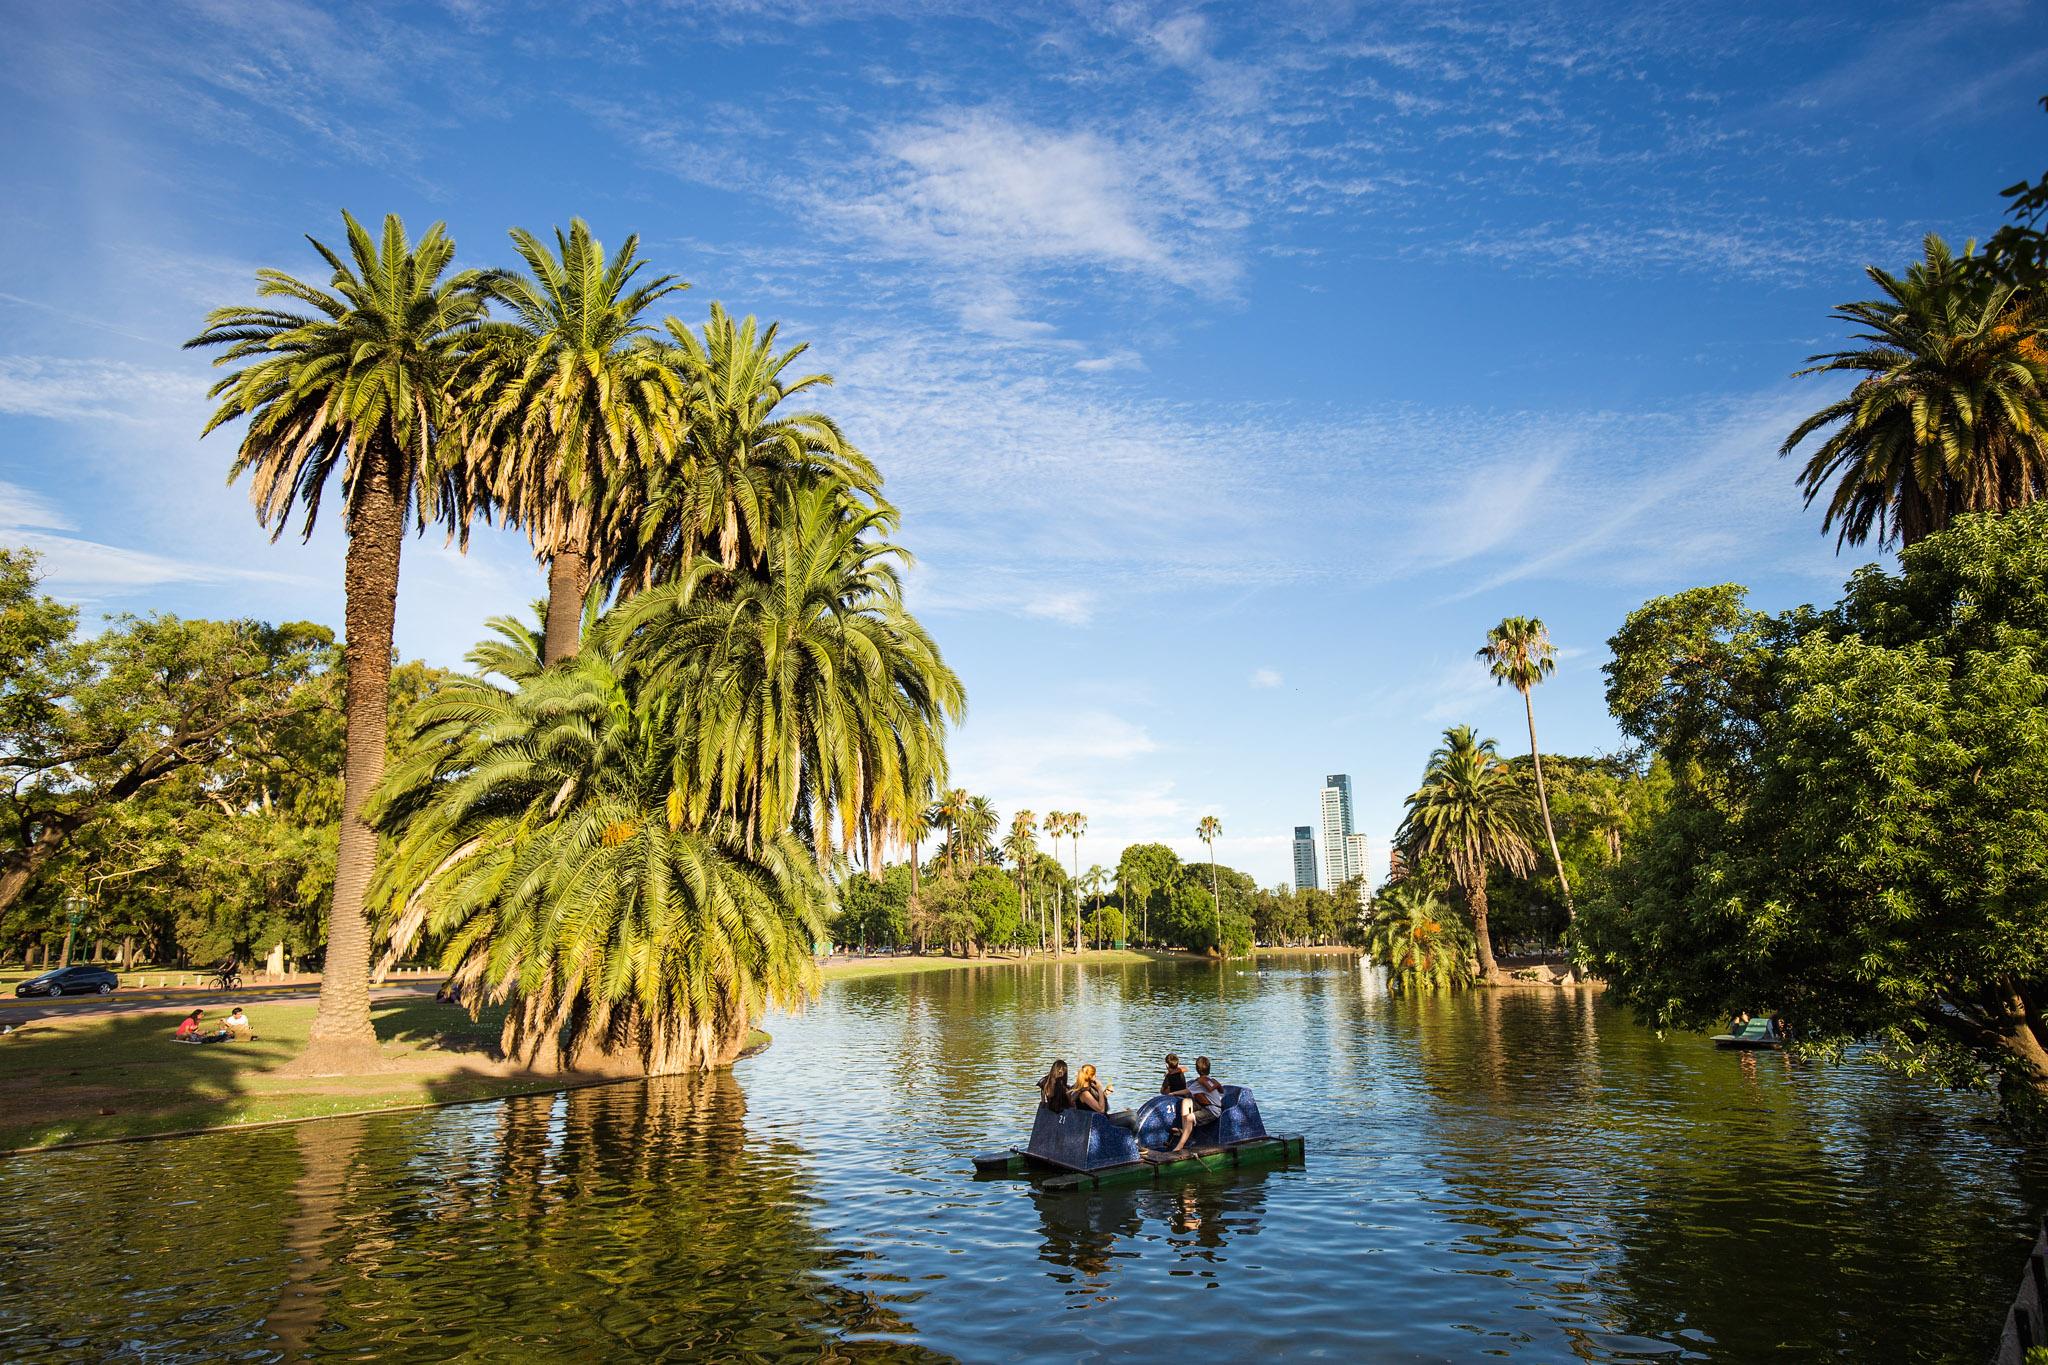 Wedding-travellers-Argentina-Buenos-Aires-Botanical-Garden-Jardin-Botanico-Lake-Palms